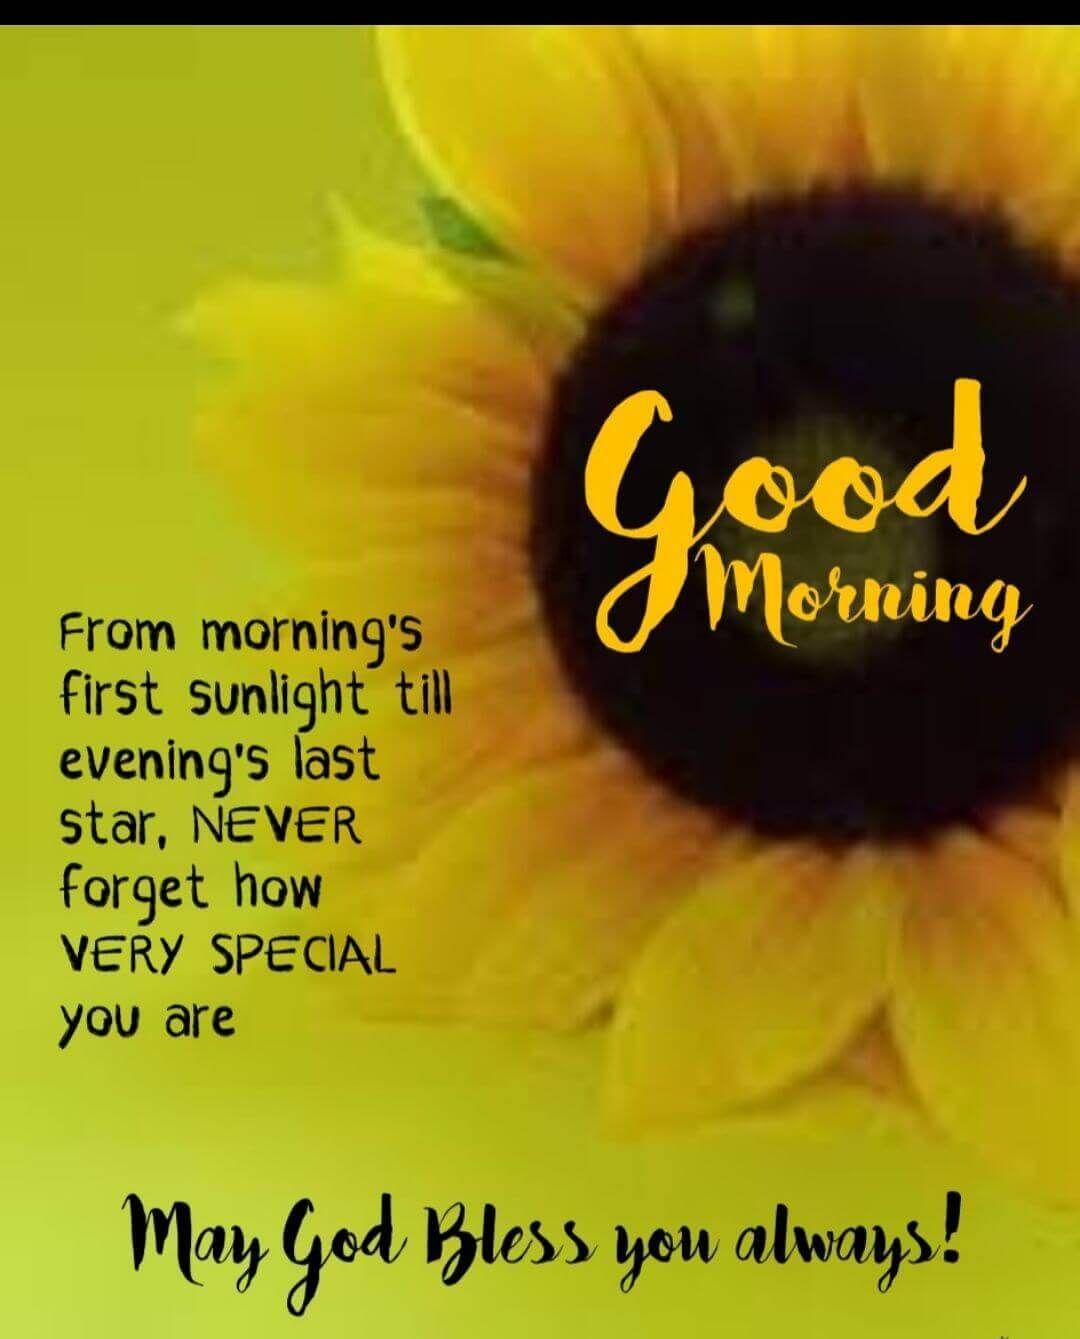 Best Good Morning Wishes Pinterest thumbnail